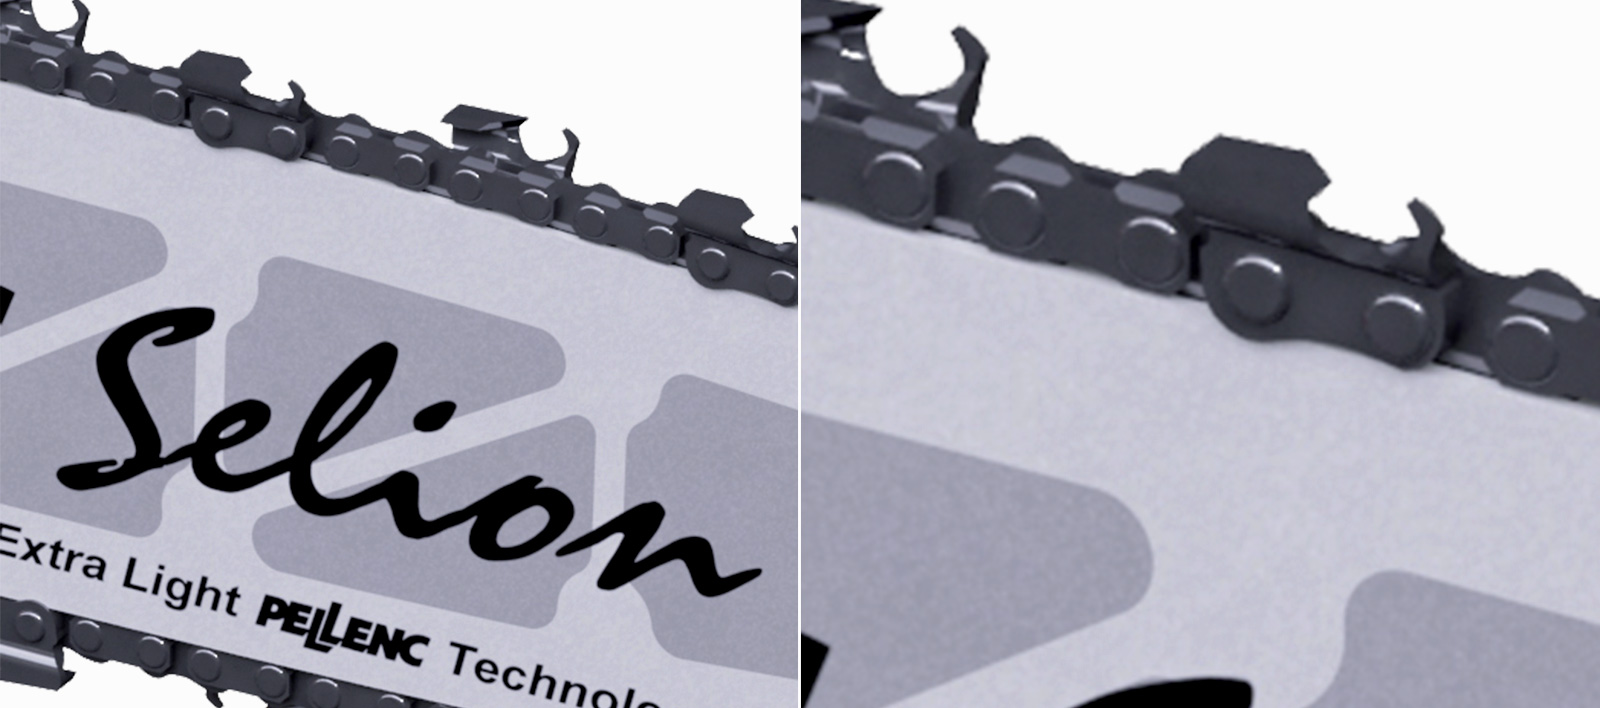 Selion-M12-Frein-de-chaine